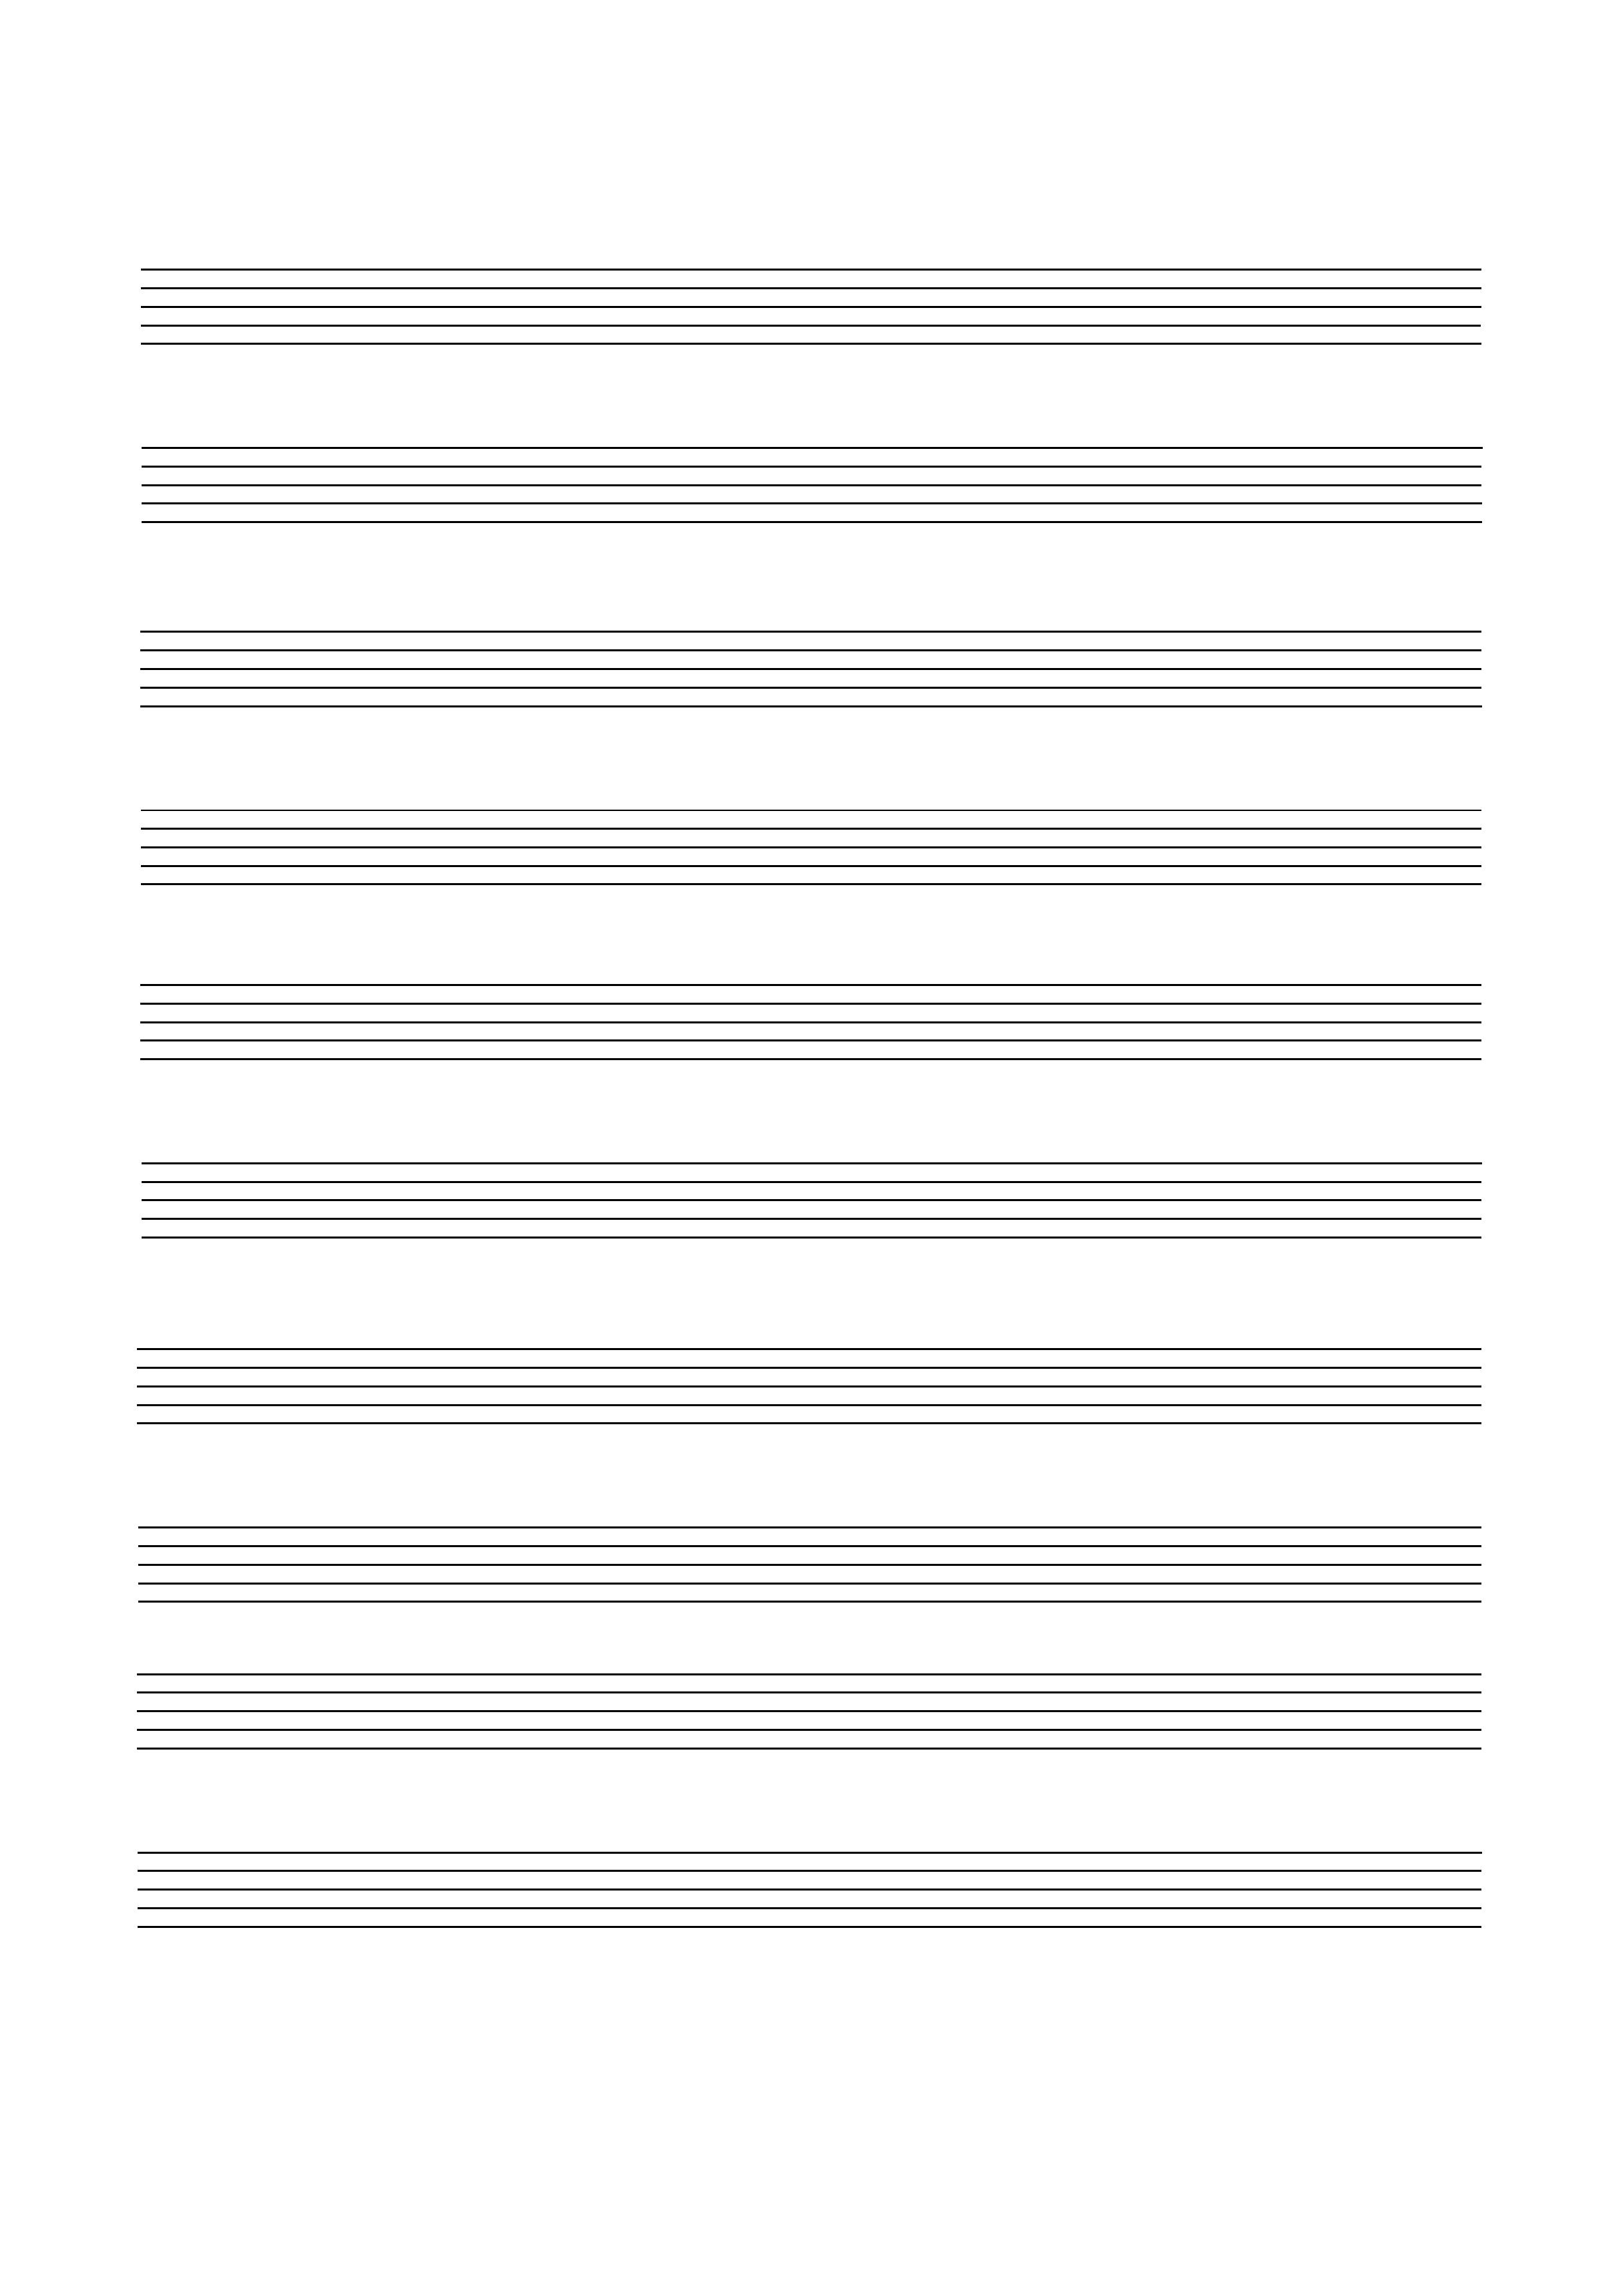 Blank Music Staff Paper Pdf - Free Printable Blank Music Staff Paper